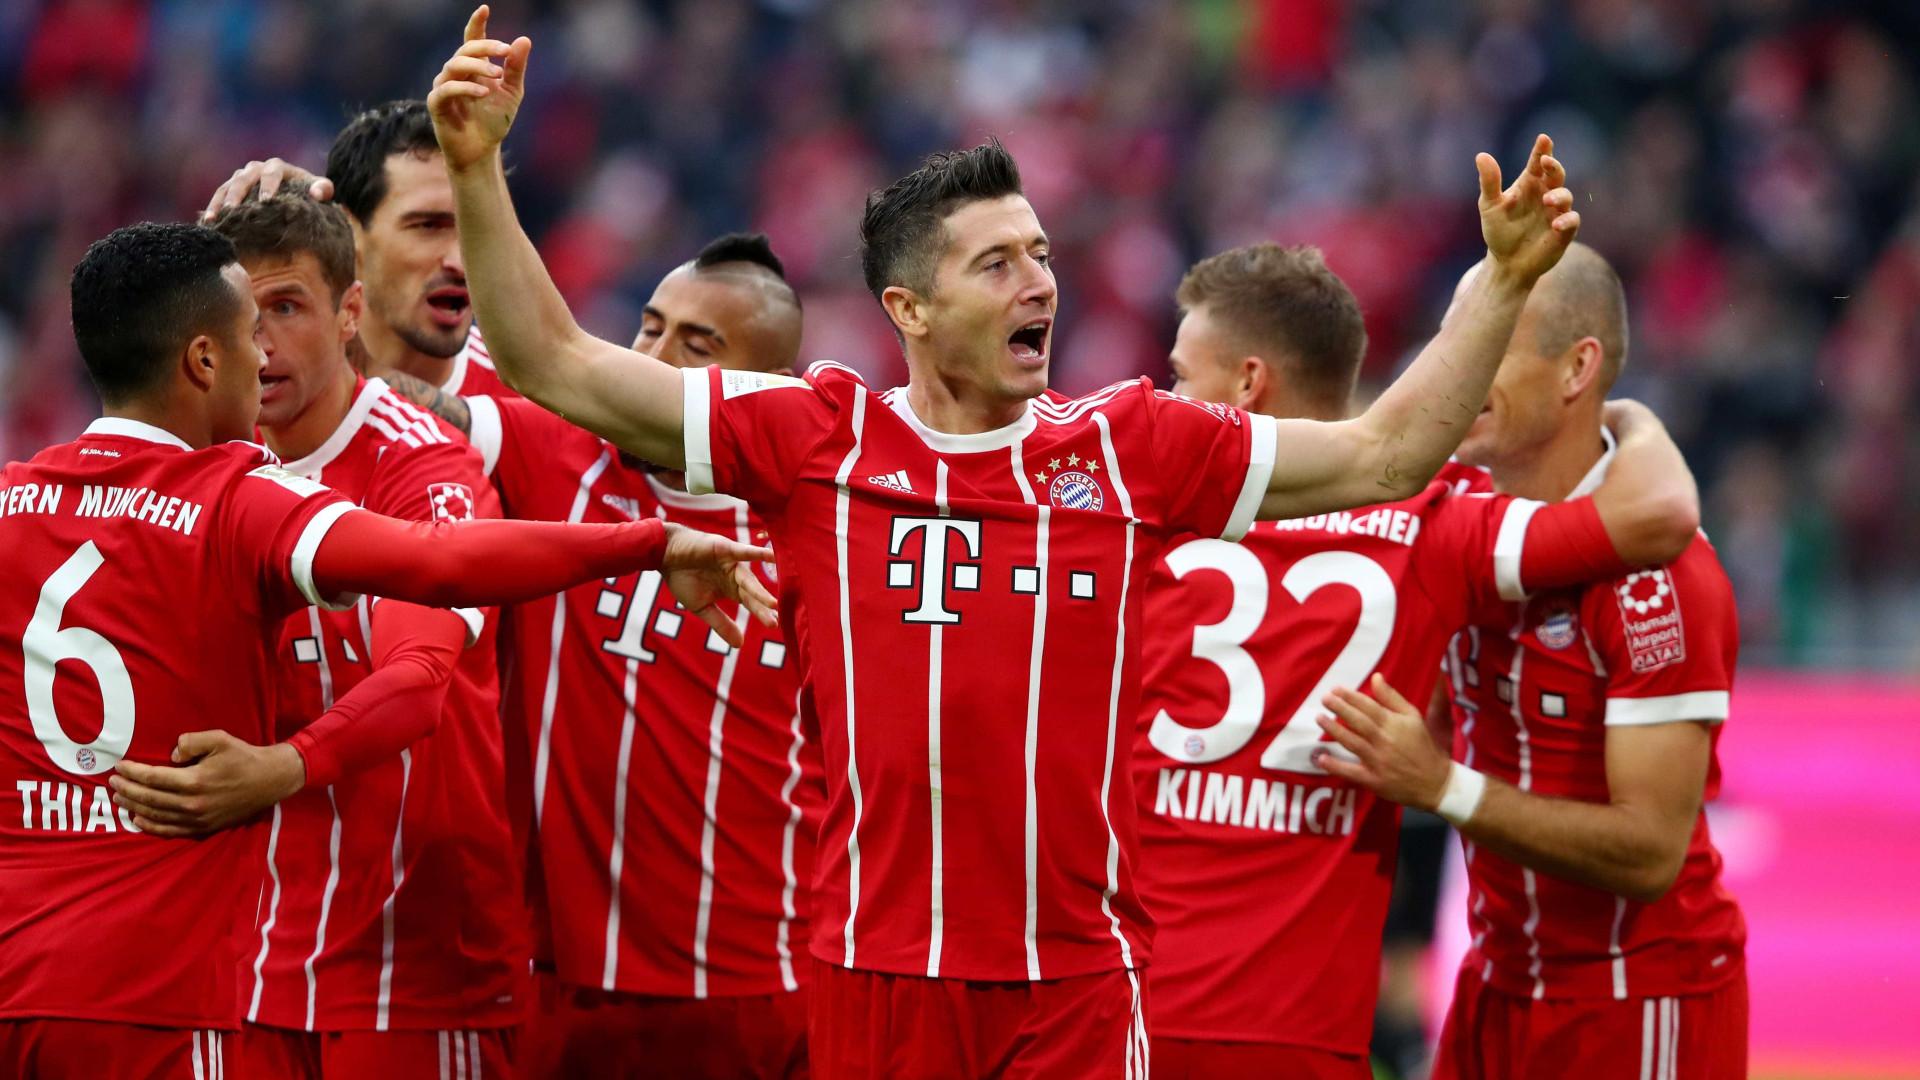 Lewandowski pretende trocar o Bayern pelo Real na próxima temporada, diz jornal